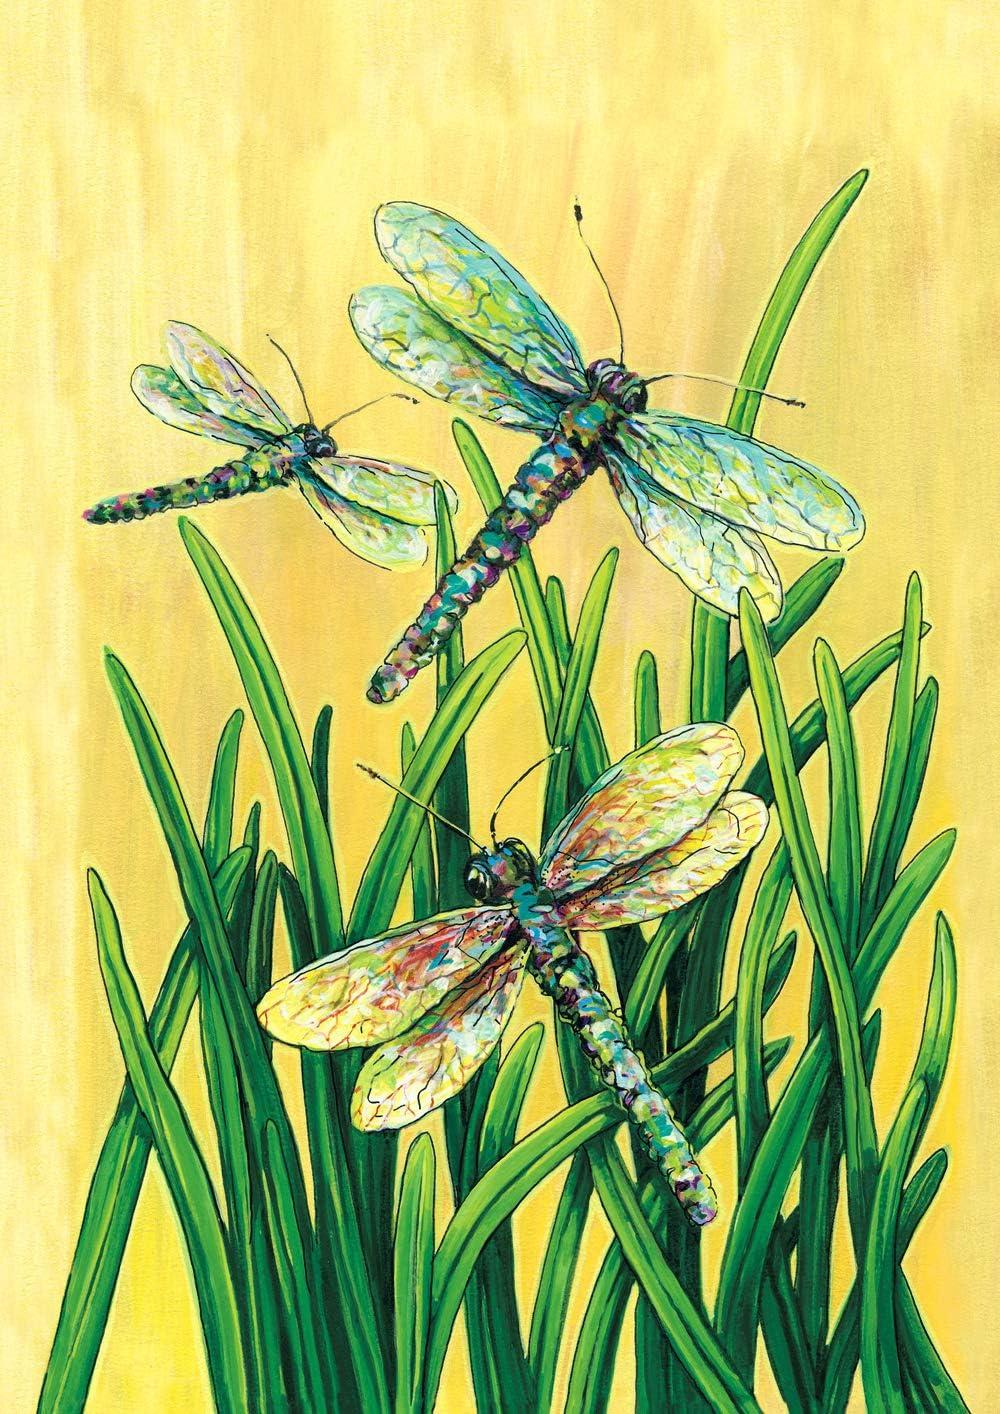 Amazon Com Toland Home Garden 101402 Dragonflies In Flight 28 X 40 Inch Decorative House Flag 28 X 40 Outdoor Flags Garden Outdoor